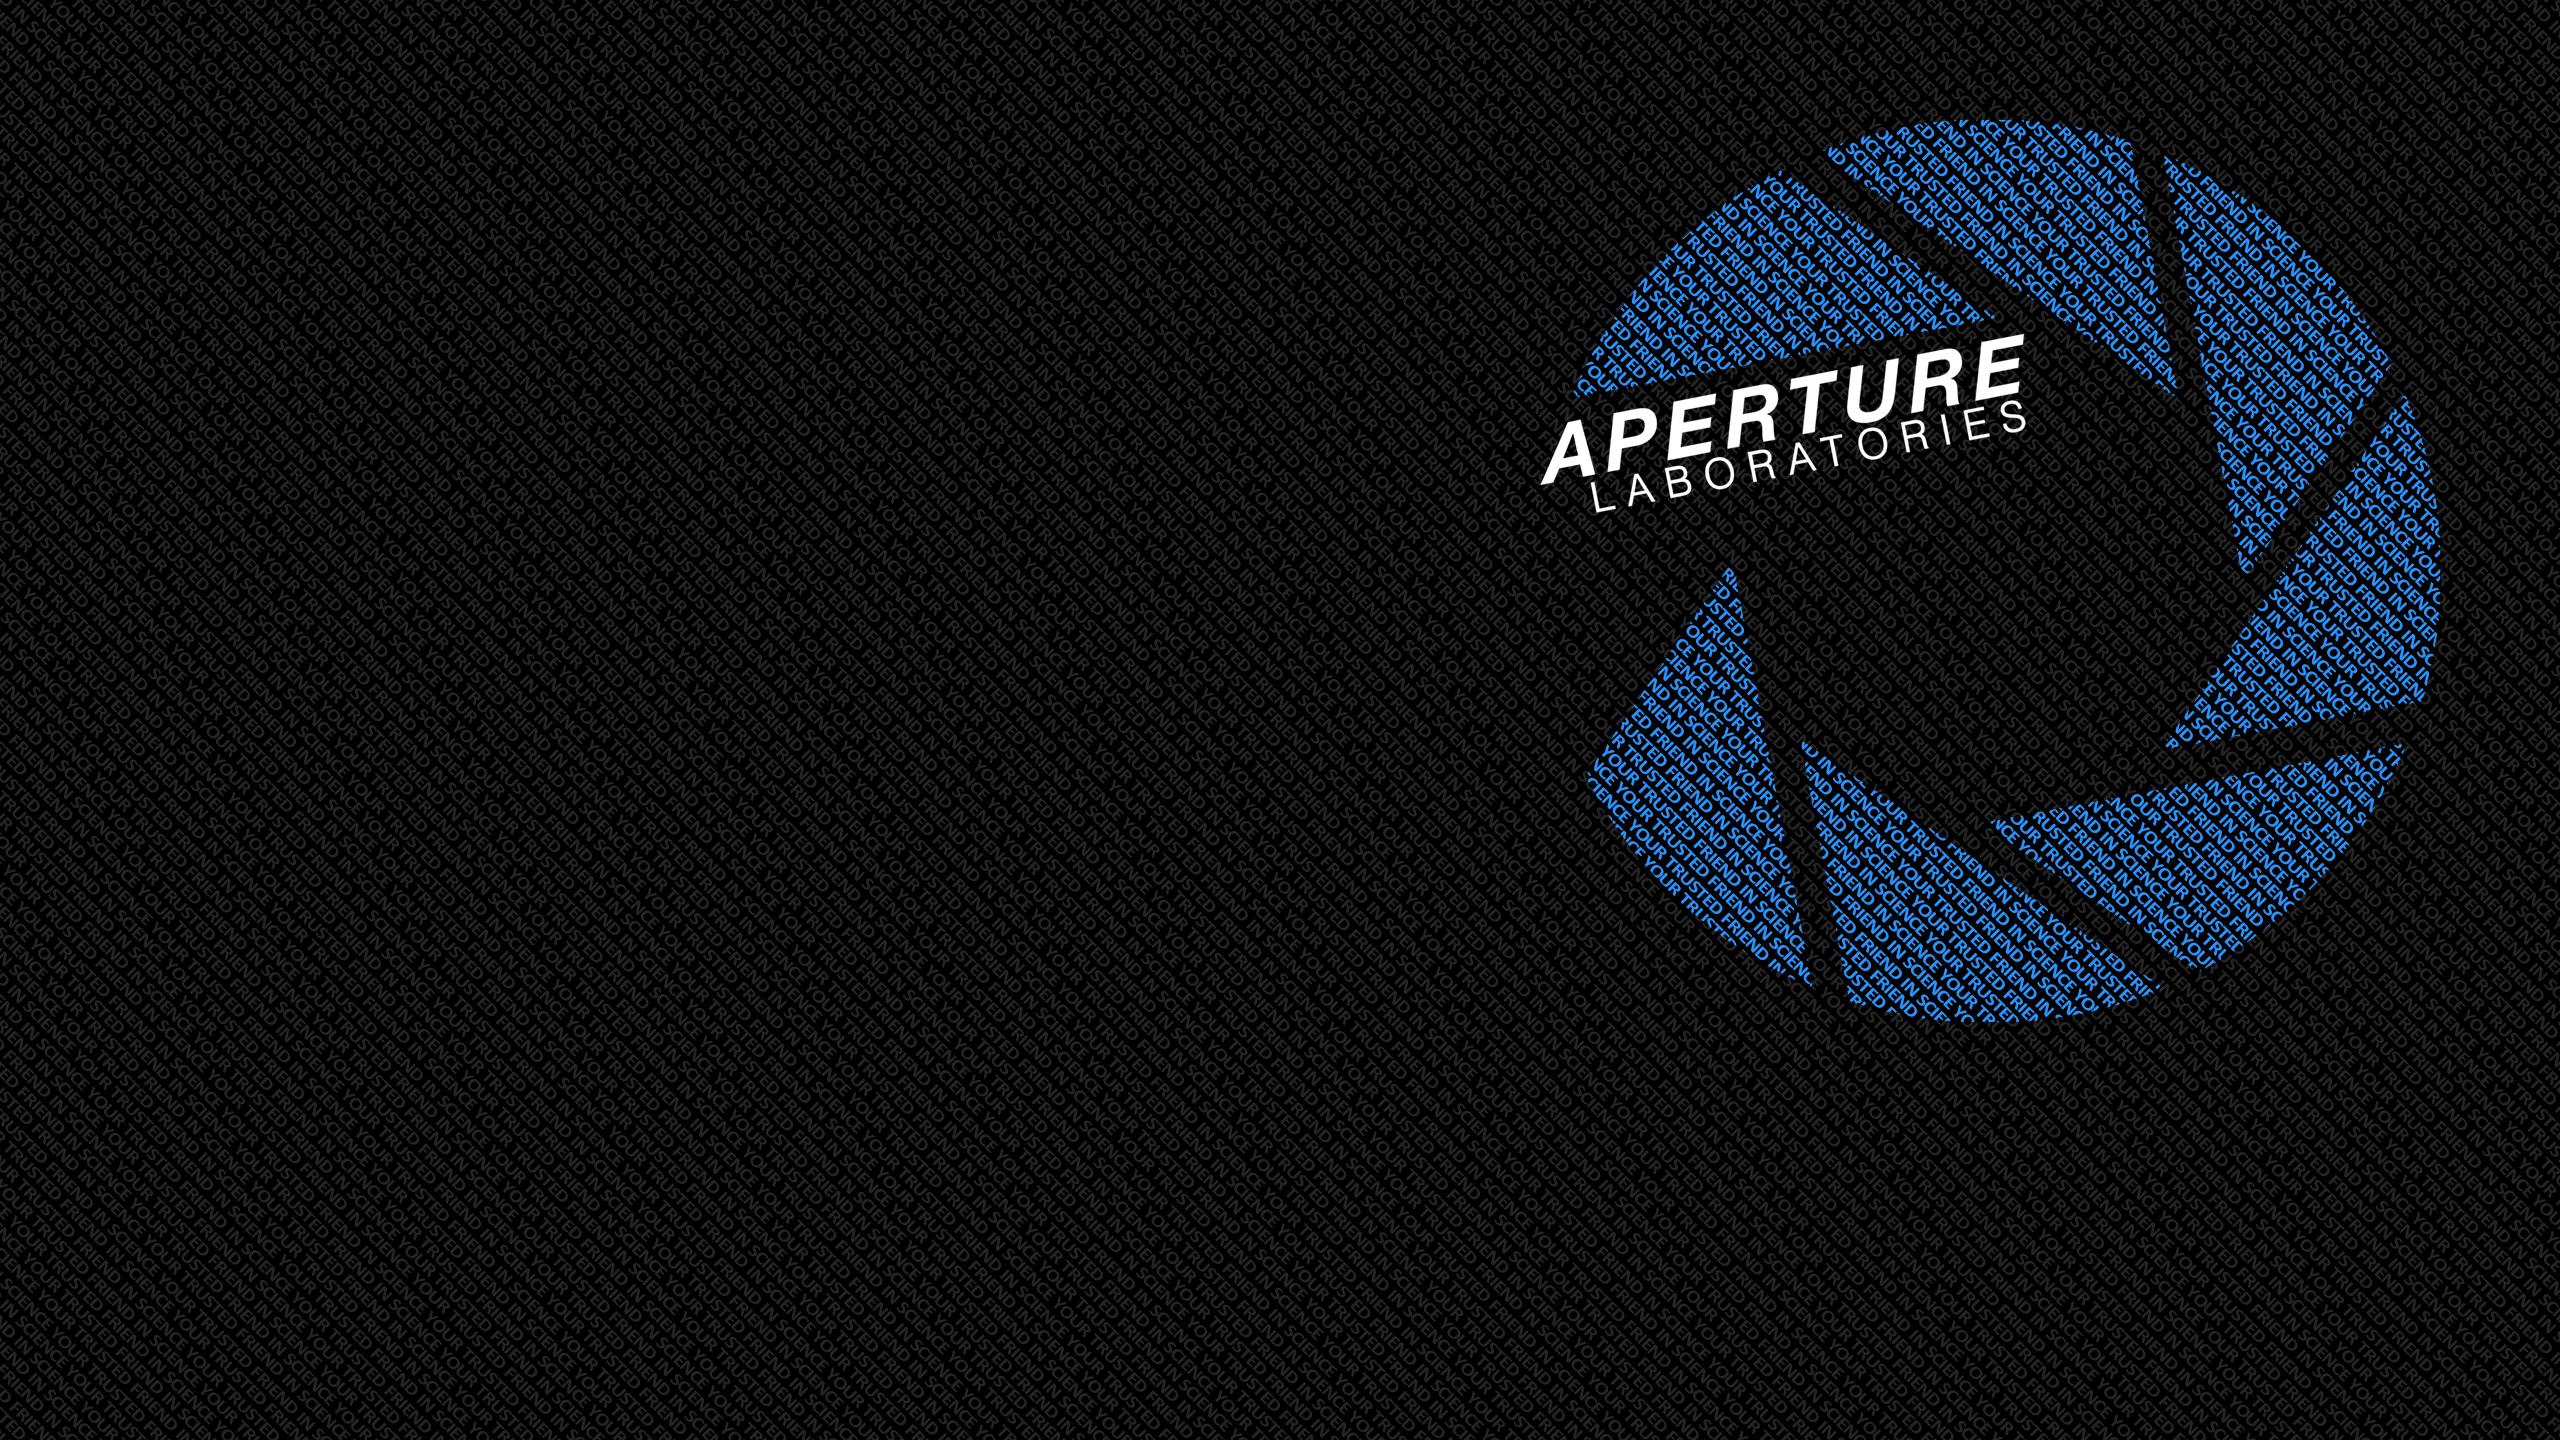 aperture laboratories - circa 2010flyntendo on deviantart